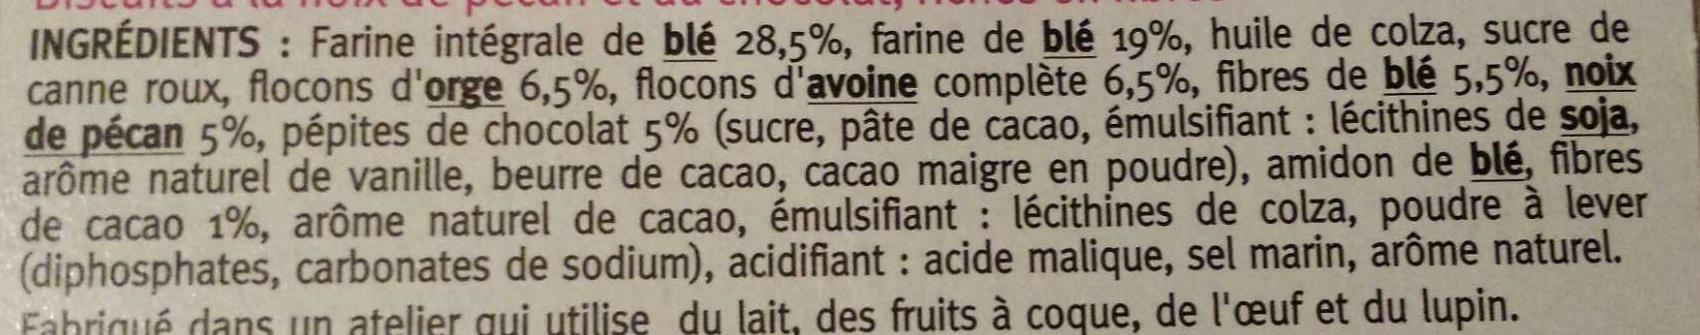 Crousti'fibres chocolat pécan - Ingredients - fr